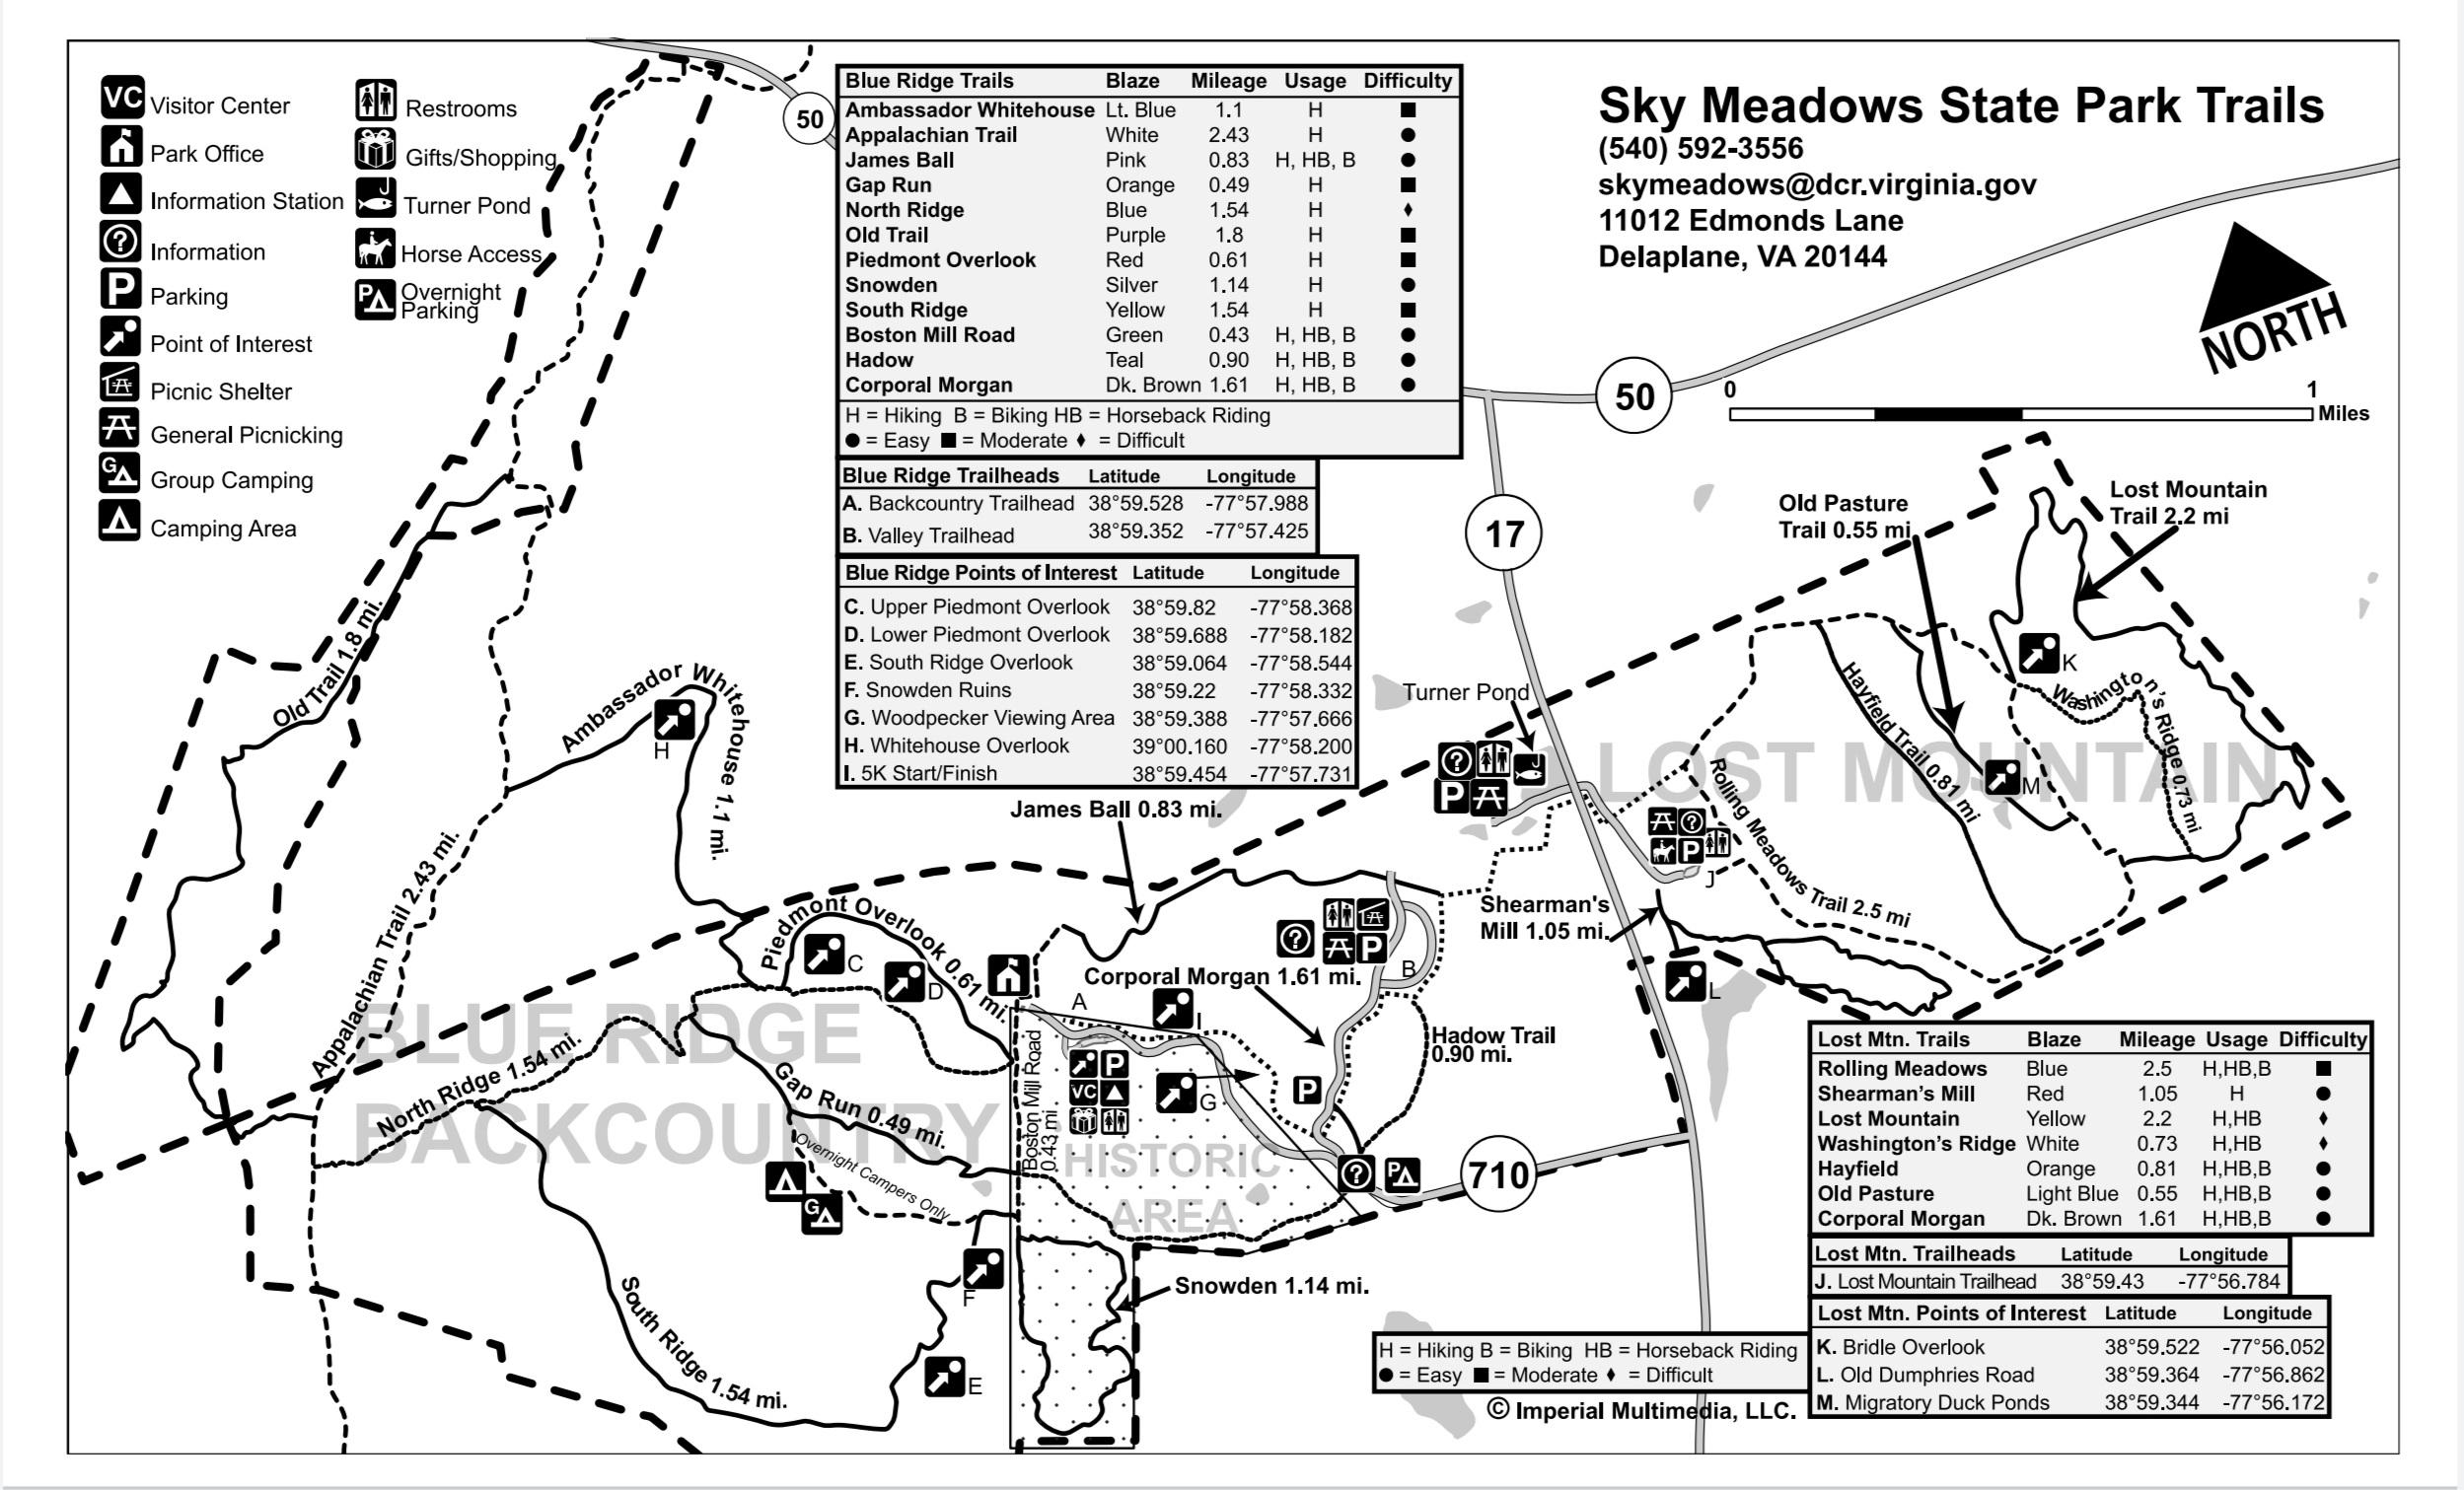 Sky Meadows State Park Trail Guide